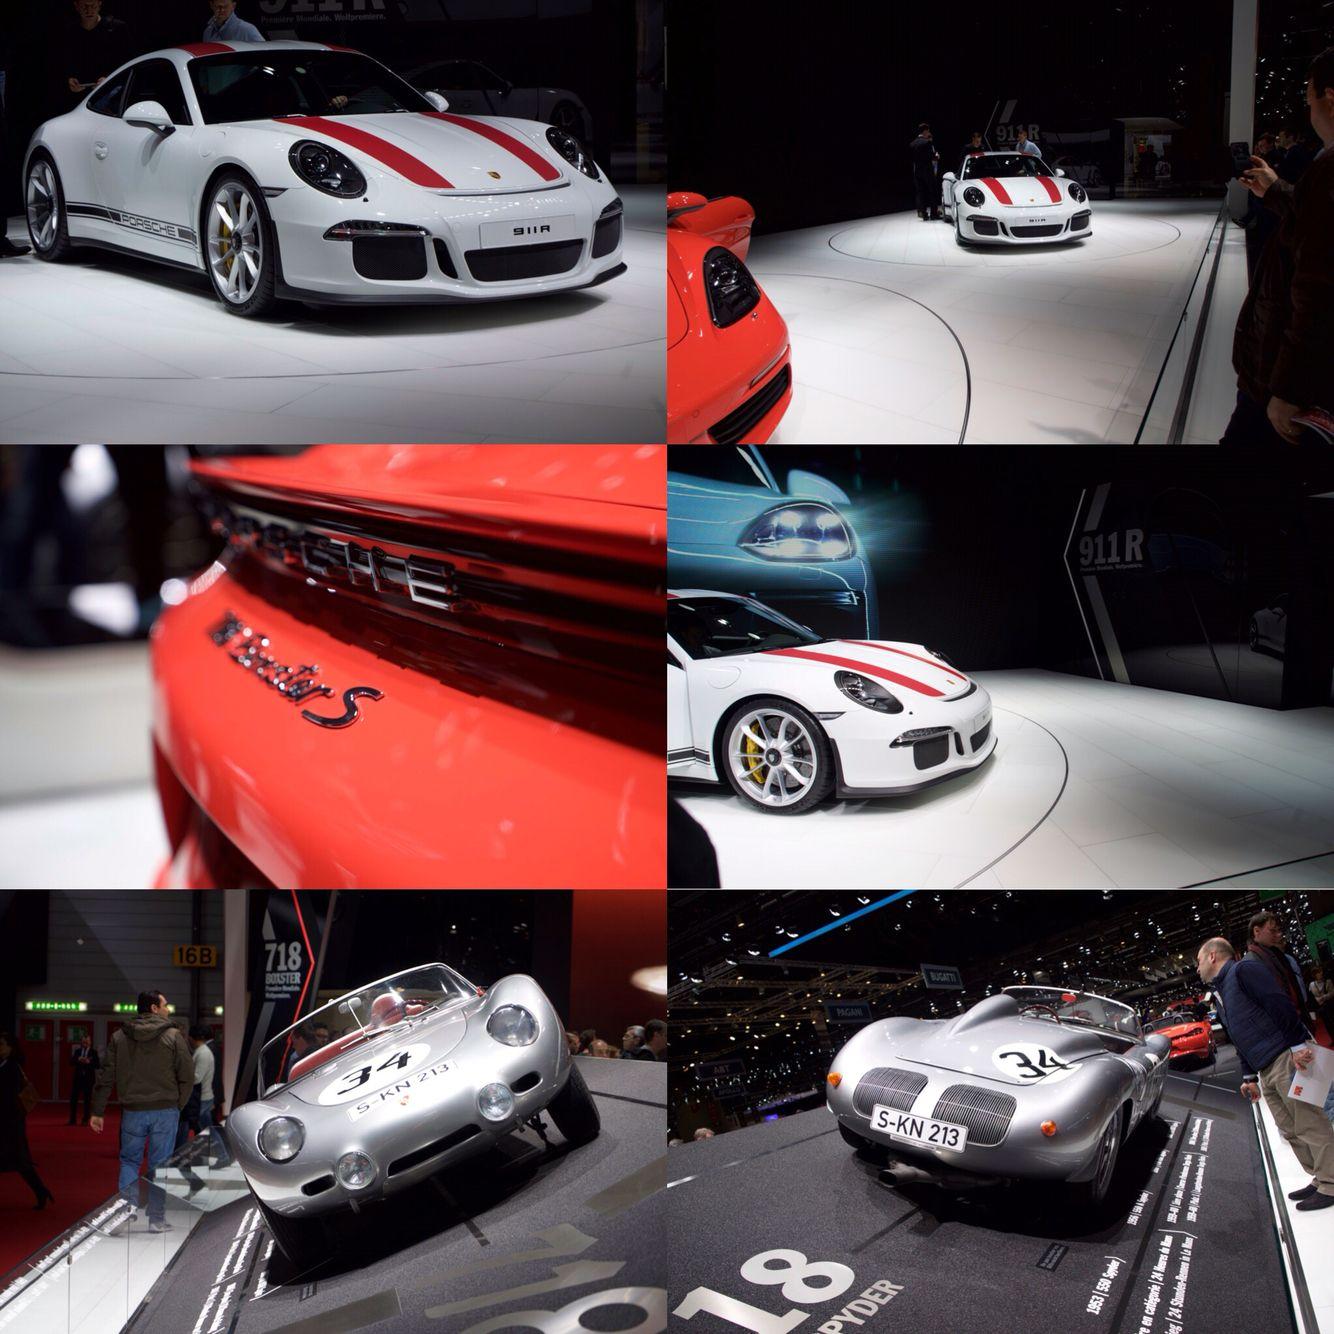 2016 Geneva Motor Show Bugatti Chiron First Look: Geneva Motor Show, Porsche, Geneva